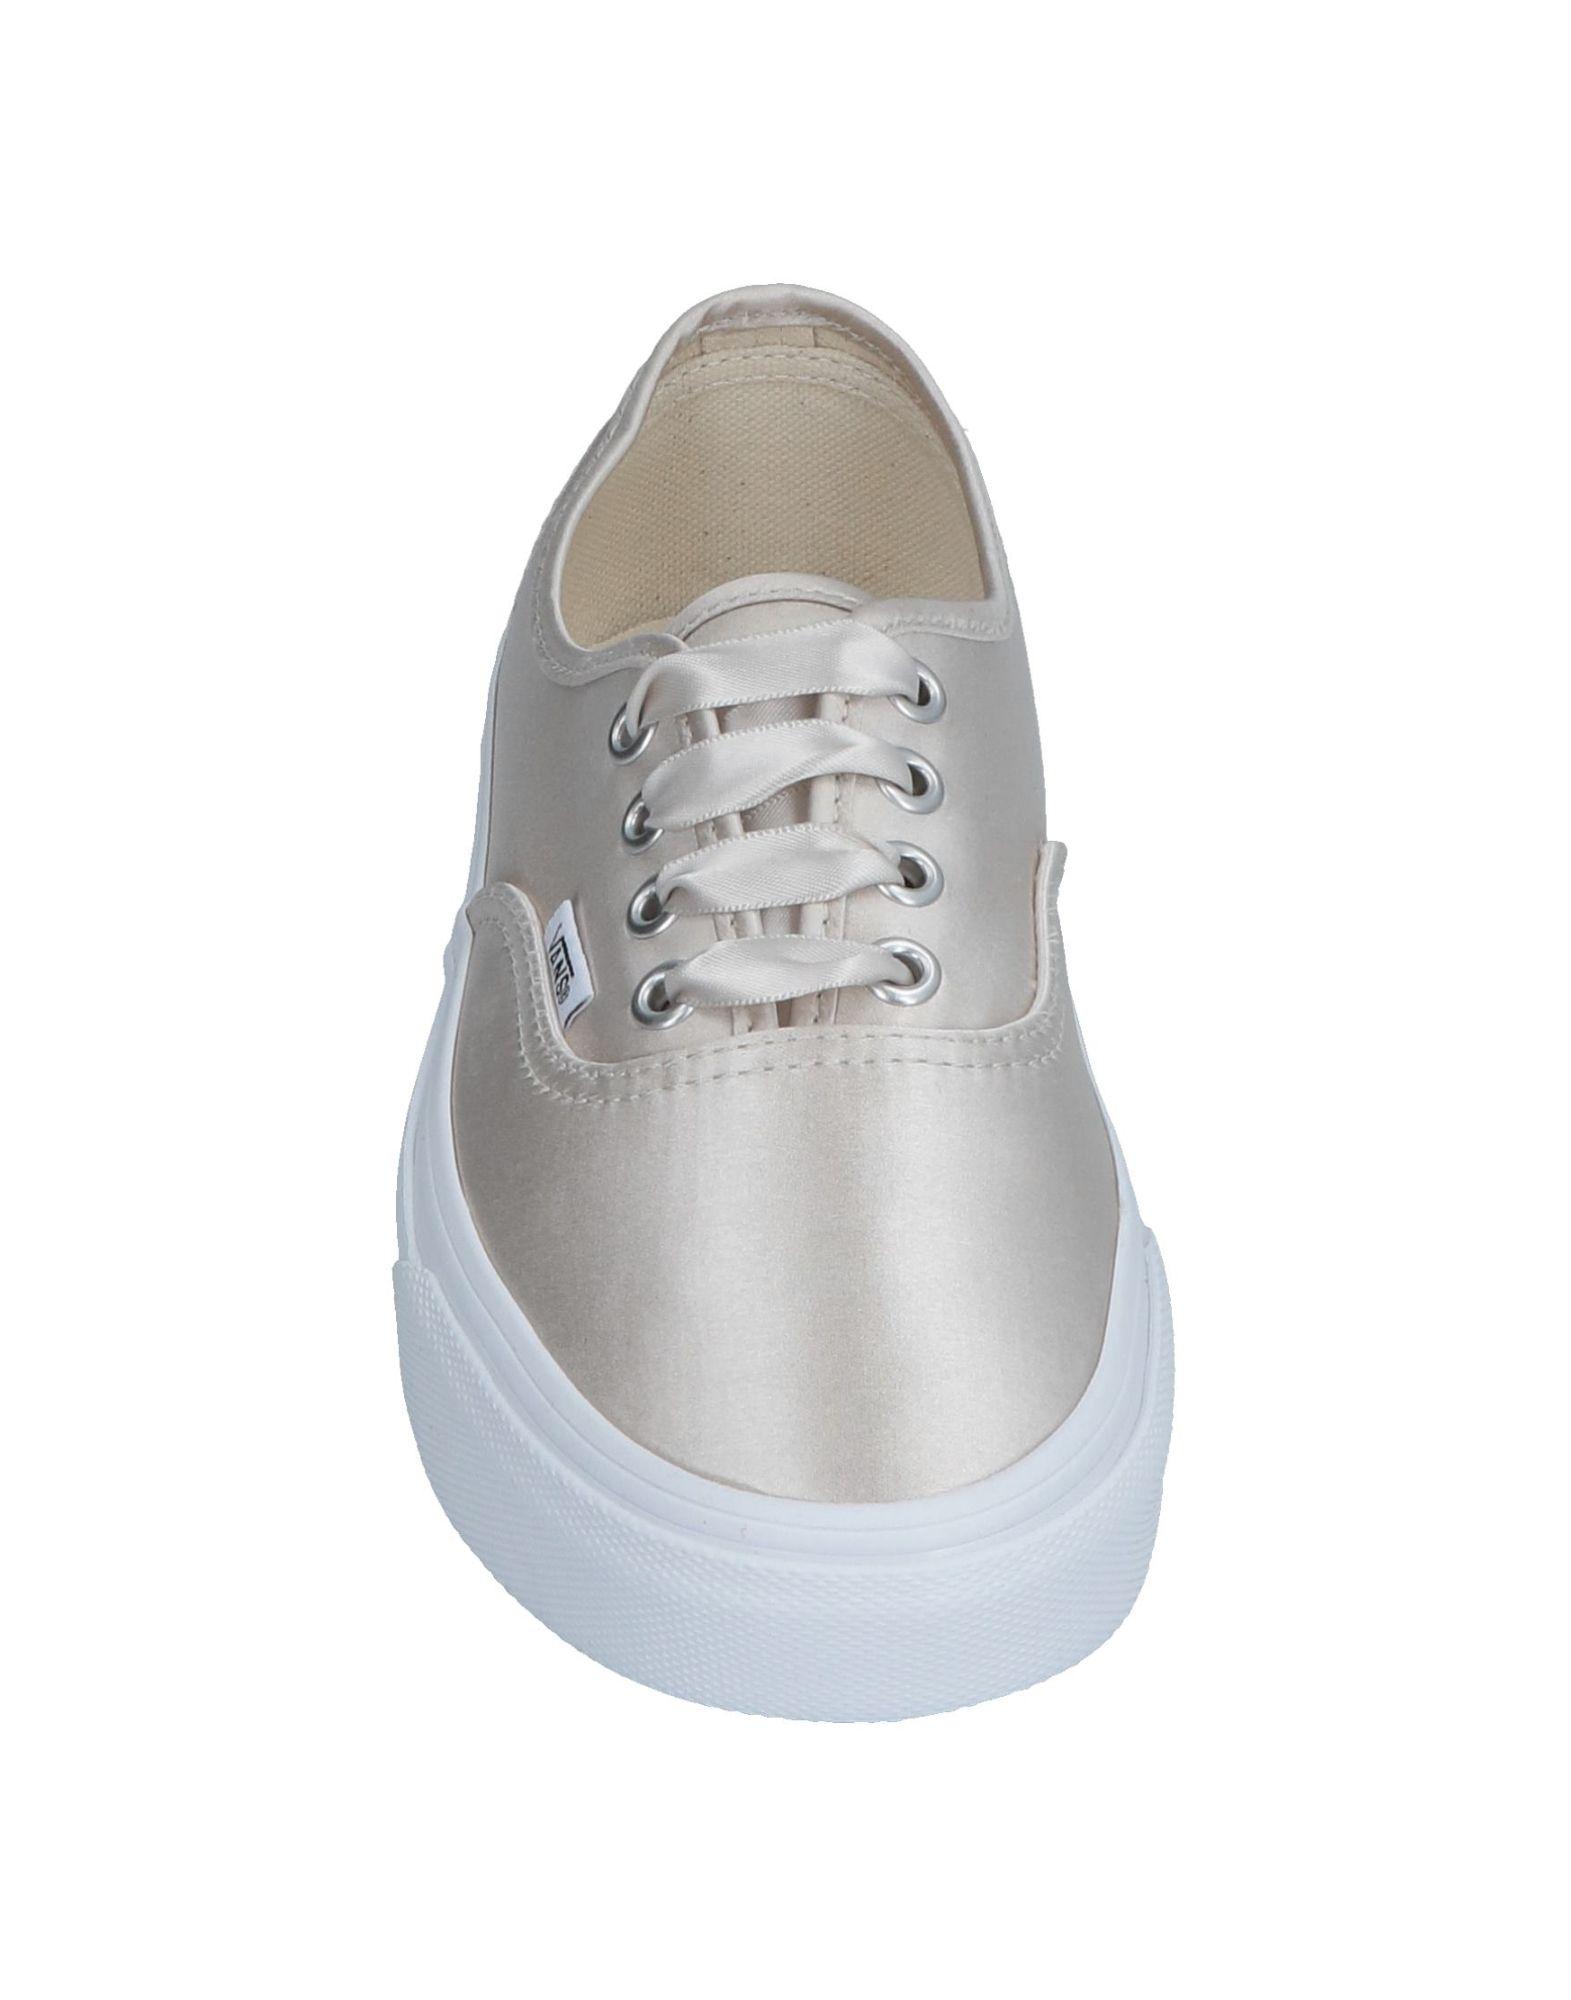 Vans Gutes Sneakers Damen Gutes Vans Preis-Leistungs-Verhältnis, es lohnt sich 7a02d6